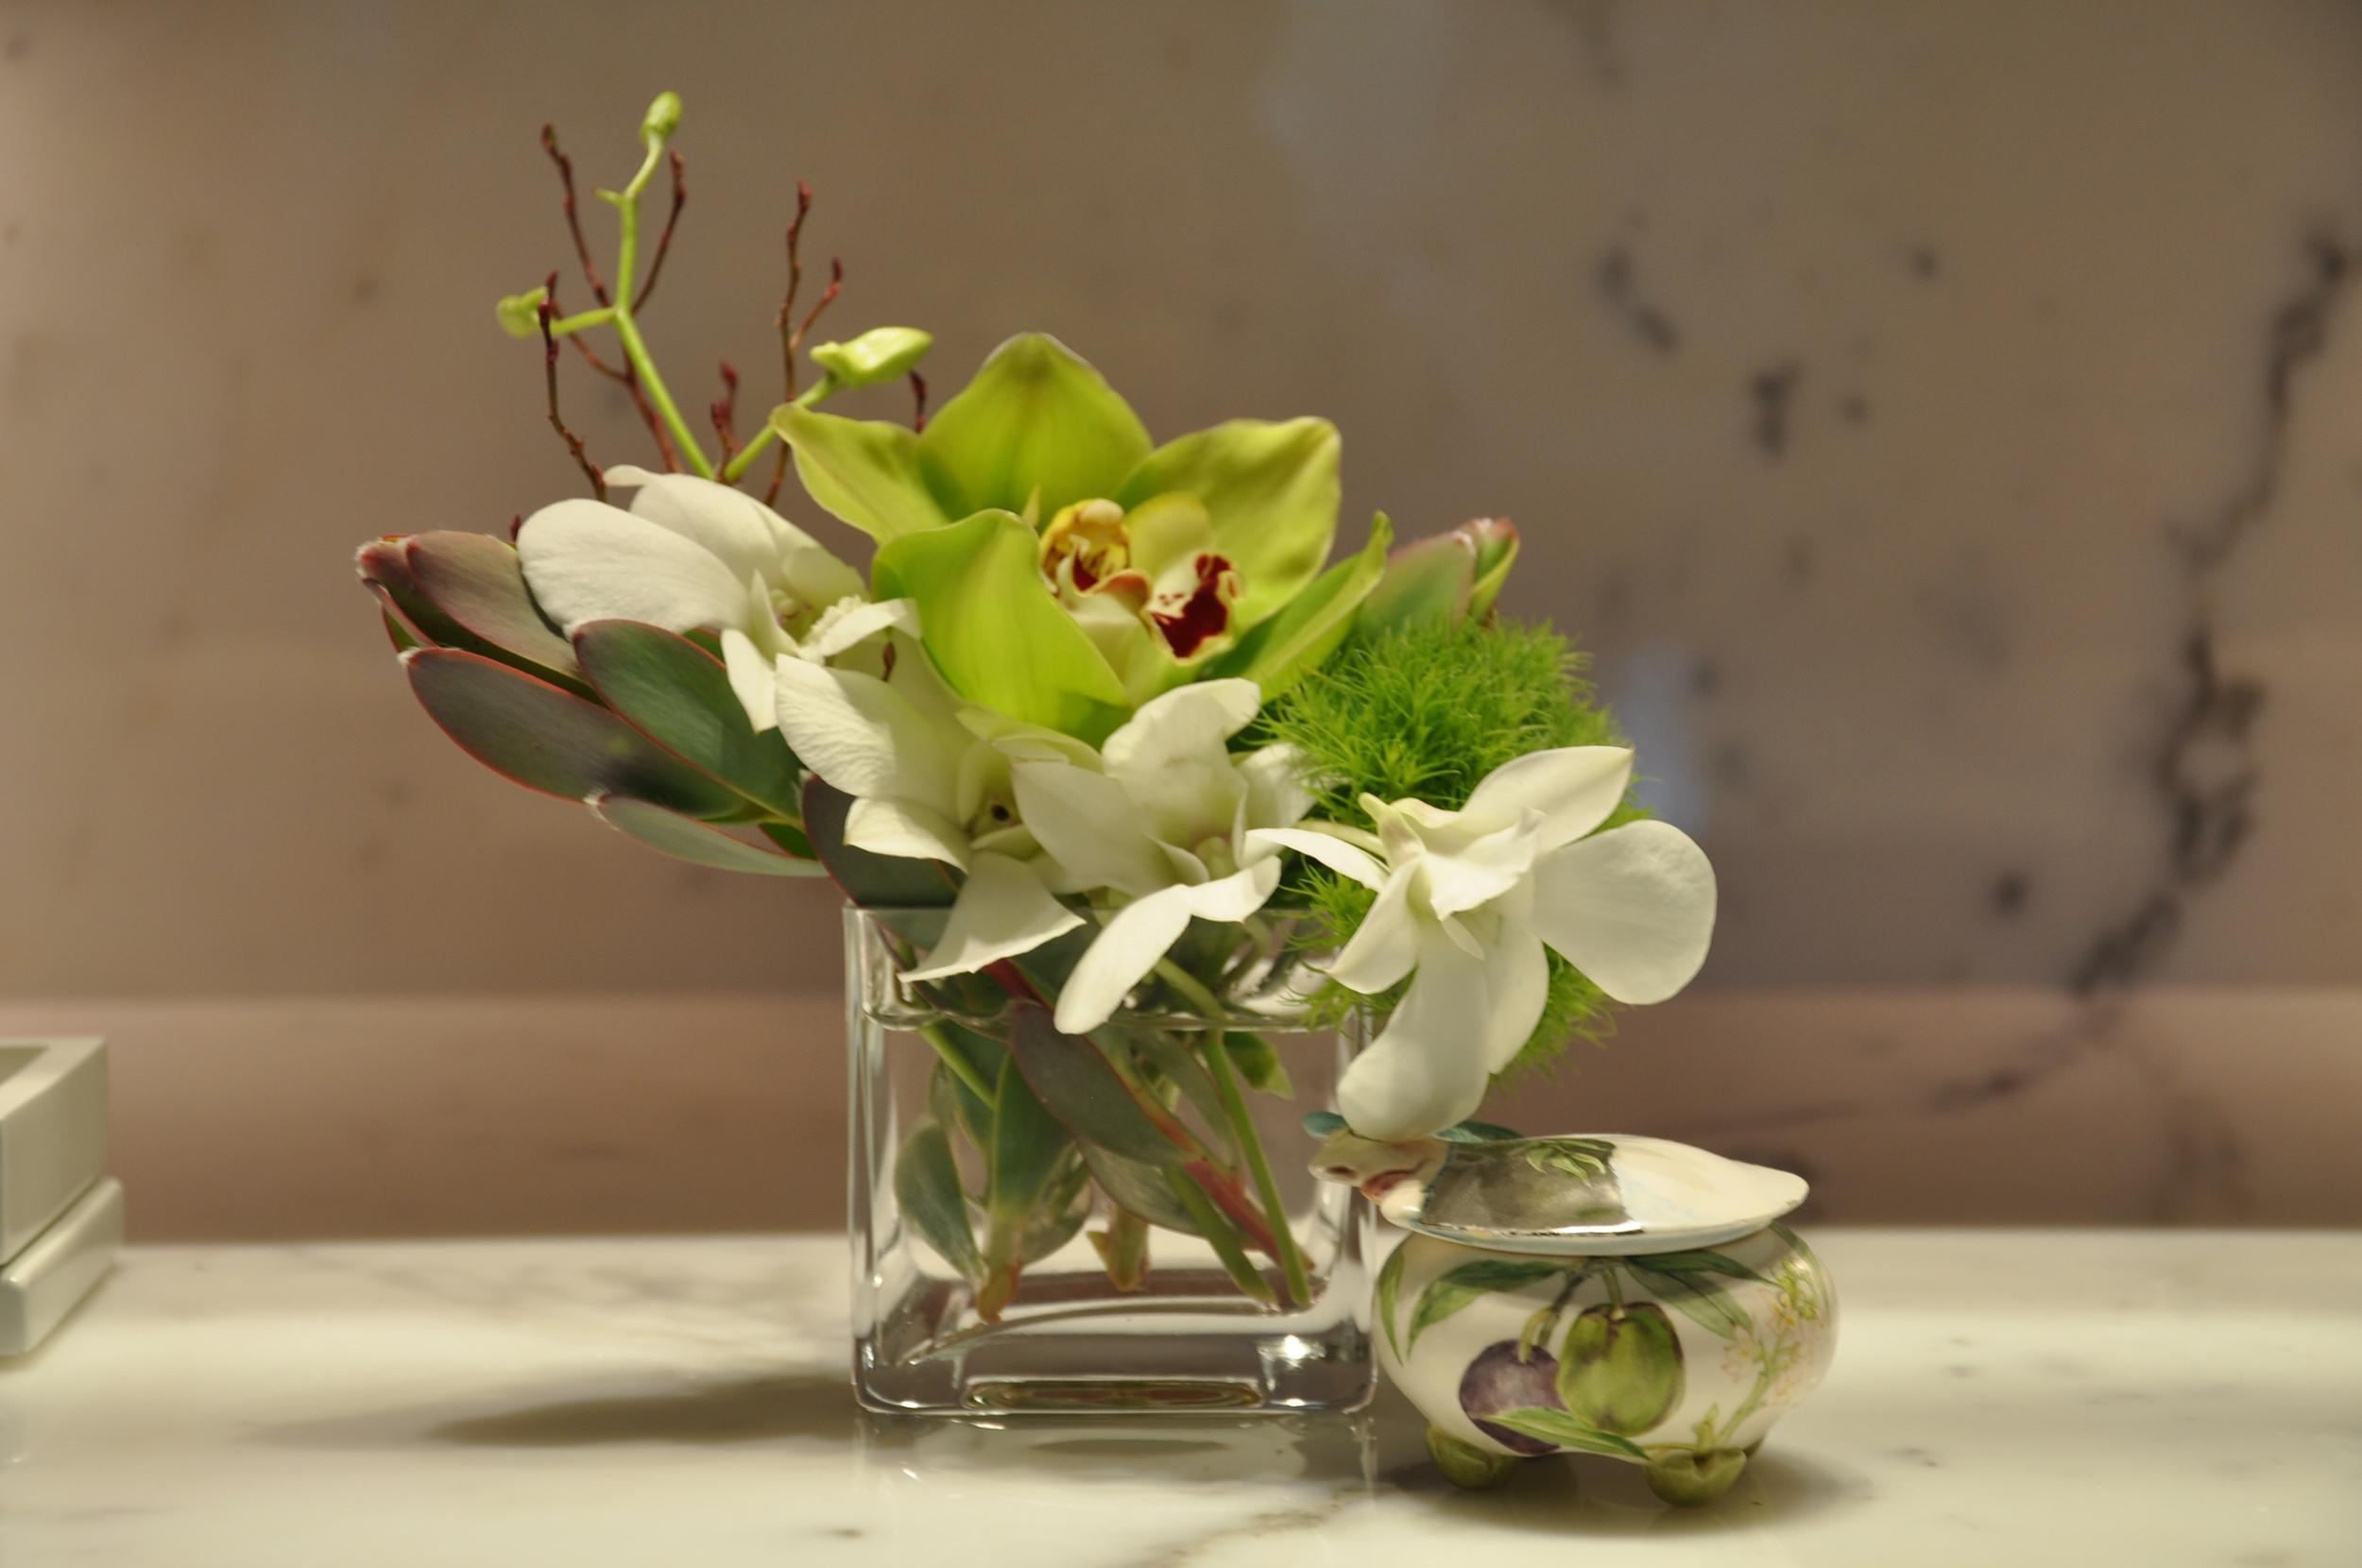 white dendrobium and green cymbidium orchids